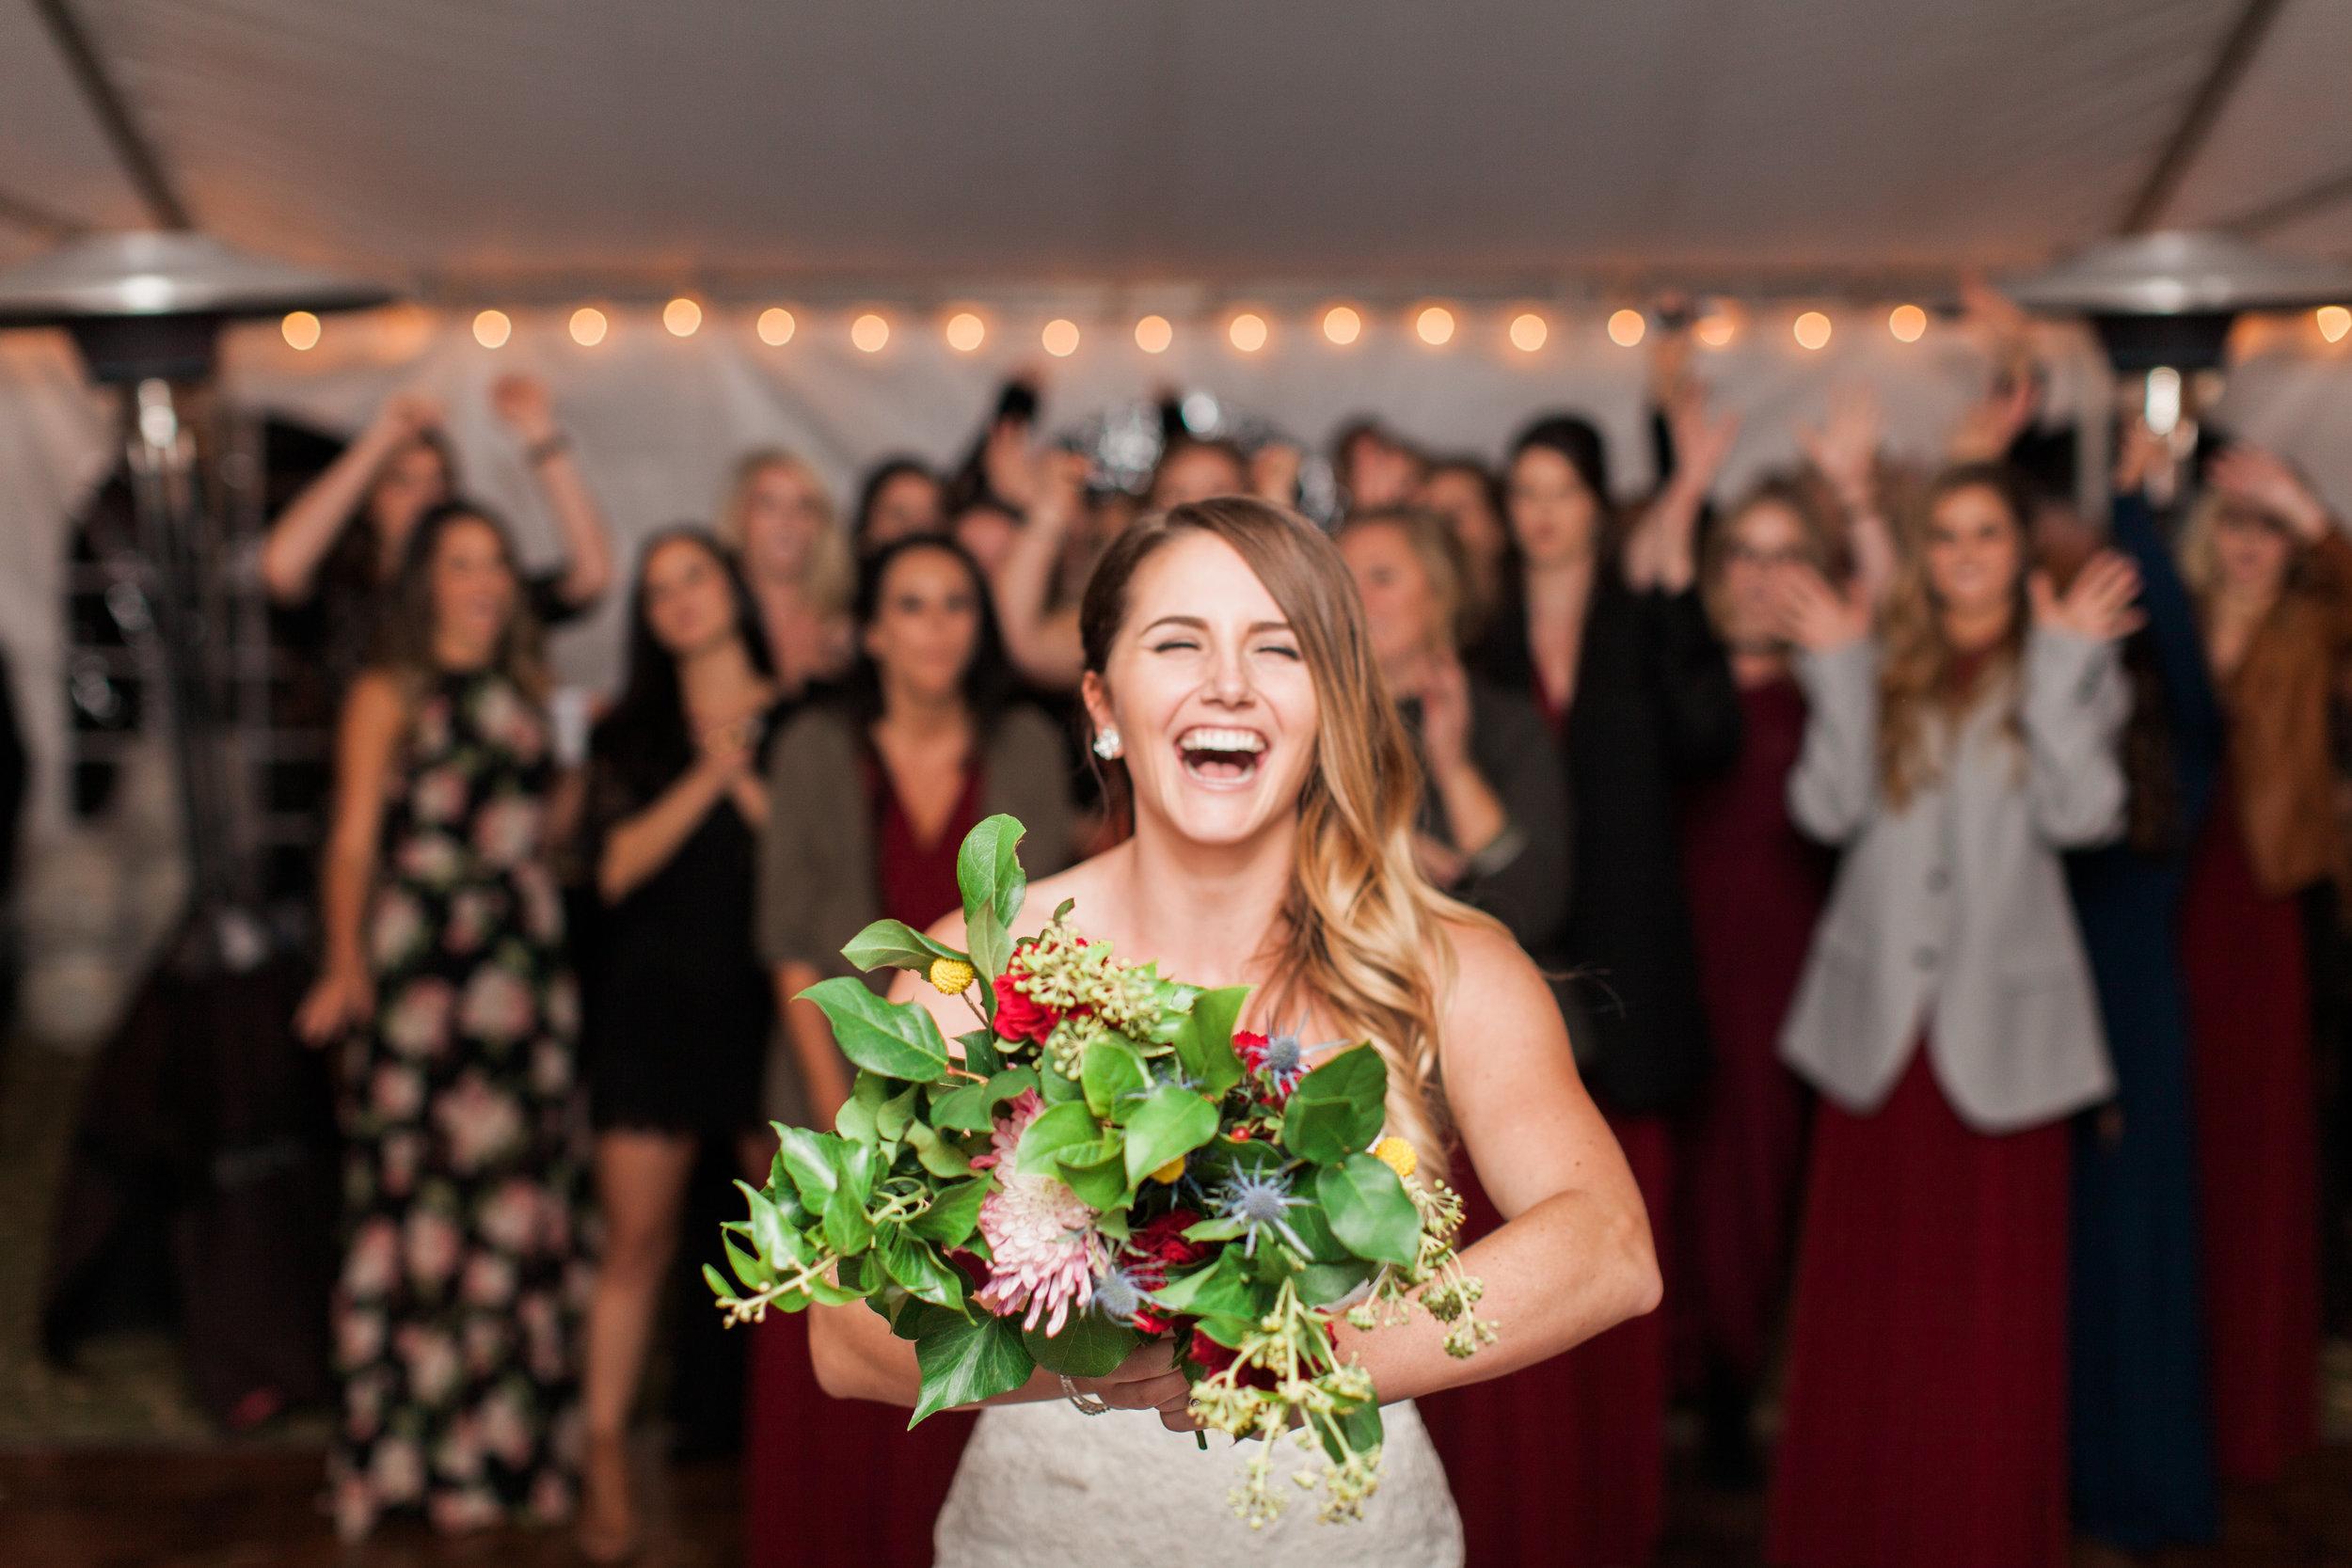 Flagstaff Forest Wedding - Reception